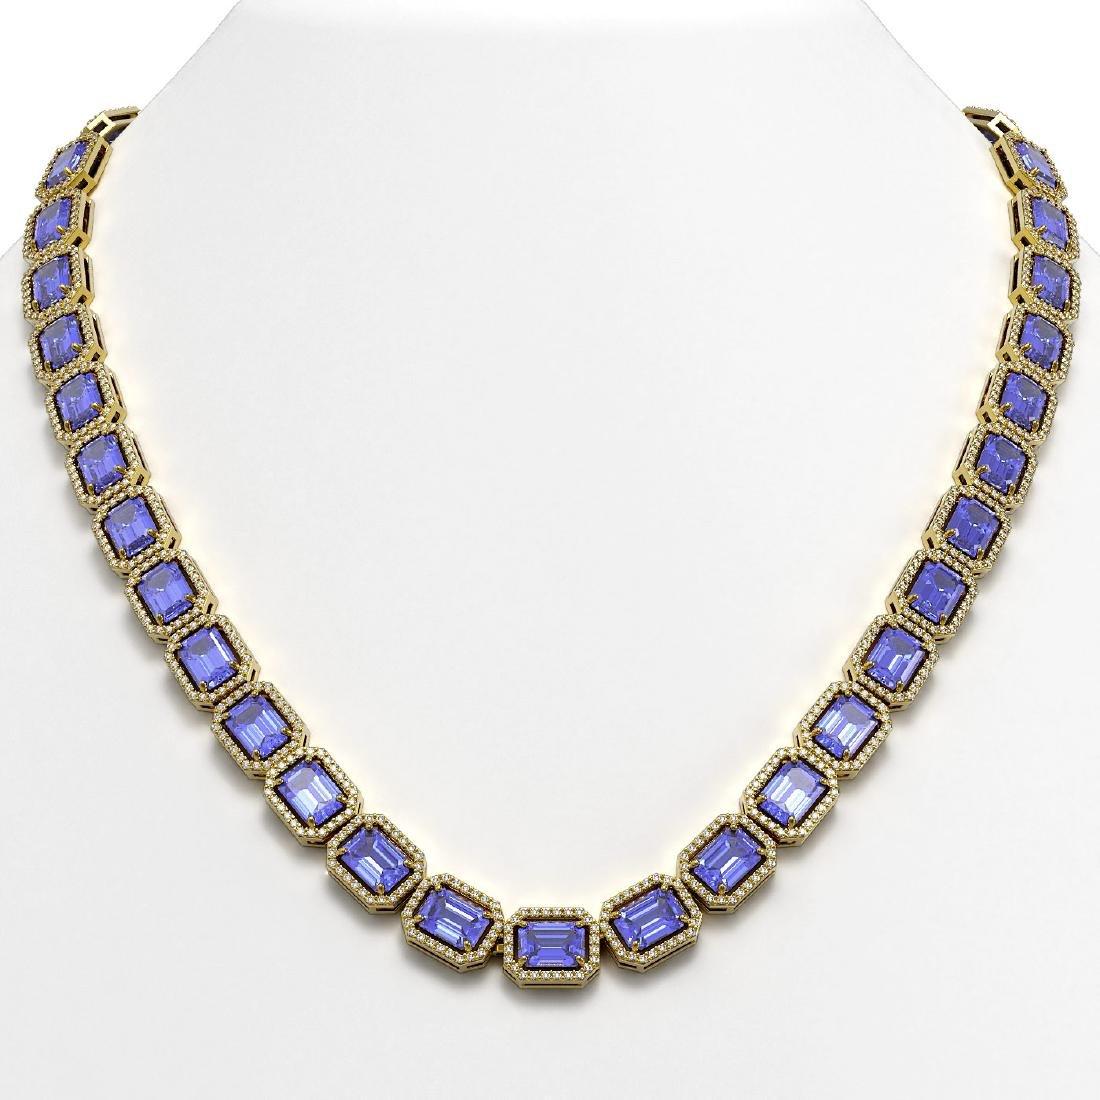 56.69 CTW Tanzanite & Diamond Halo Necklace 10K Yellow